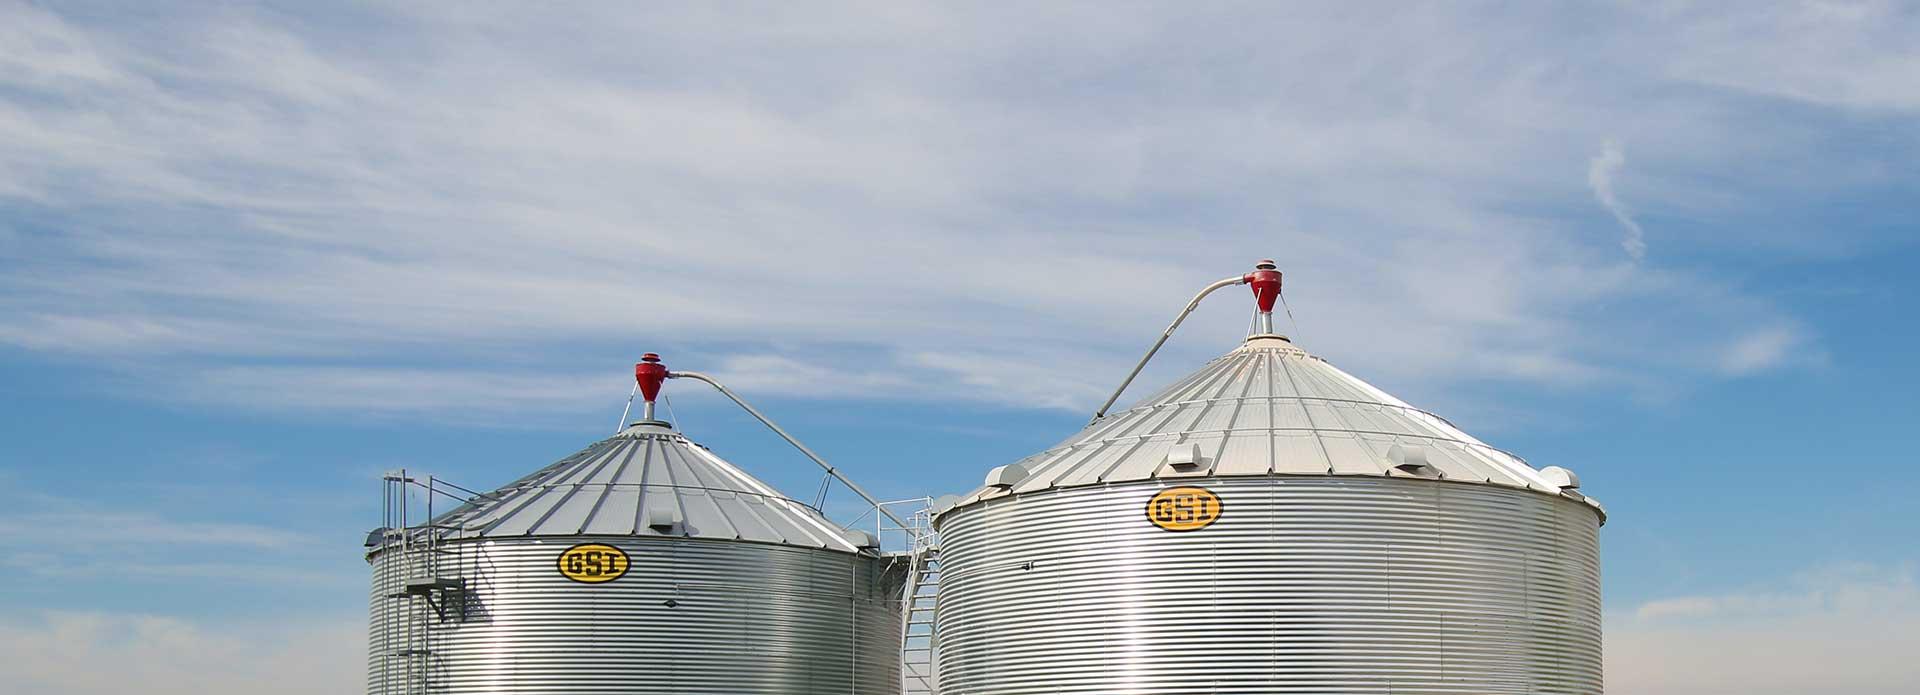 Eldon-C-Stutsman-Inc-Grain-Cyclone